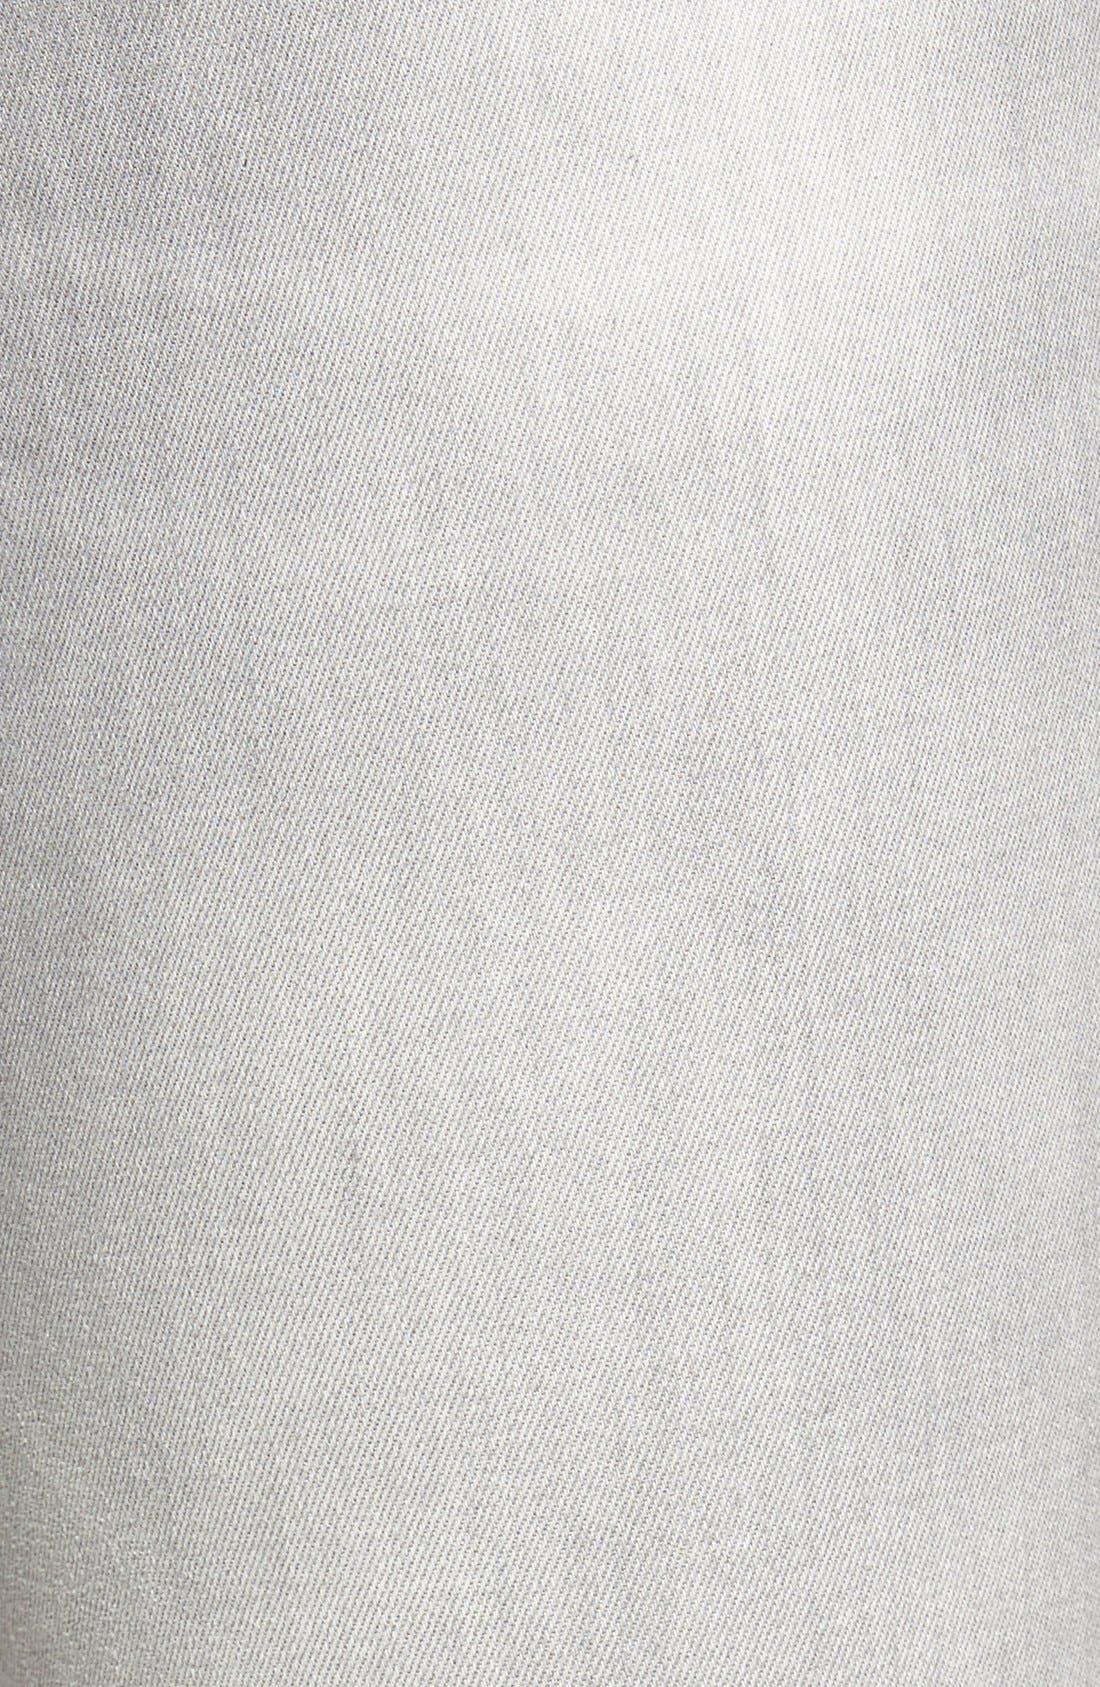 'Alissa' Stretch Skinny Jeans,                             Alternate thumbnail 5, color,                             Alissa Light Grey Tribeca